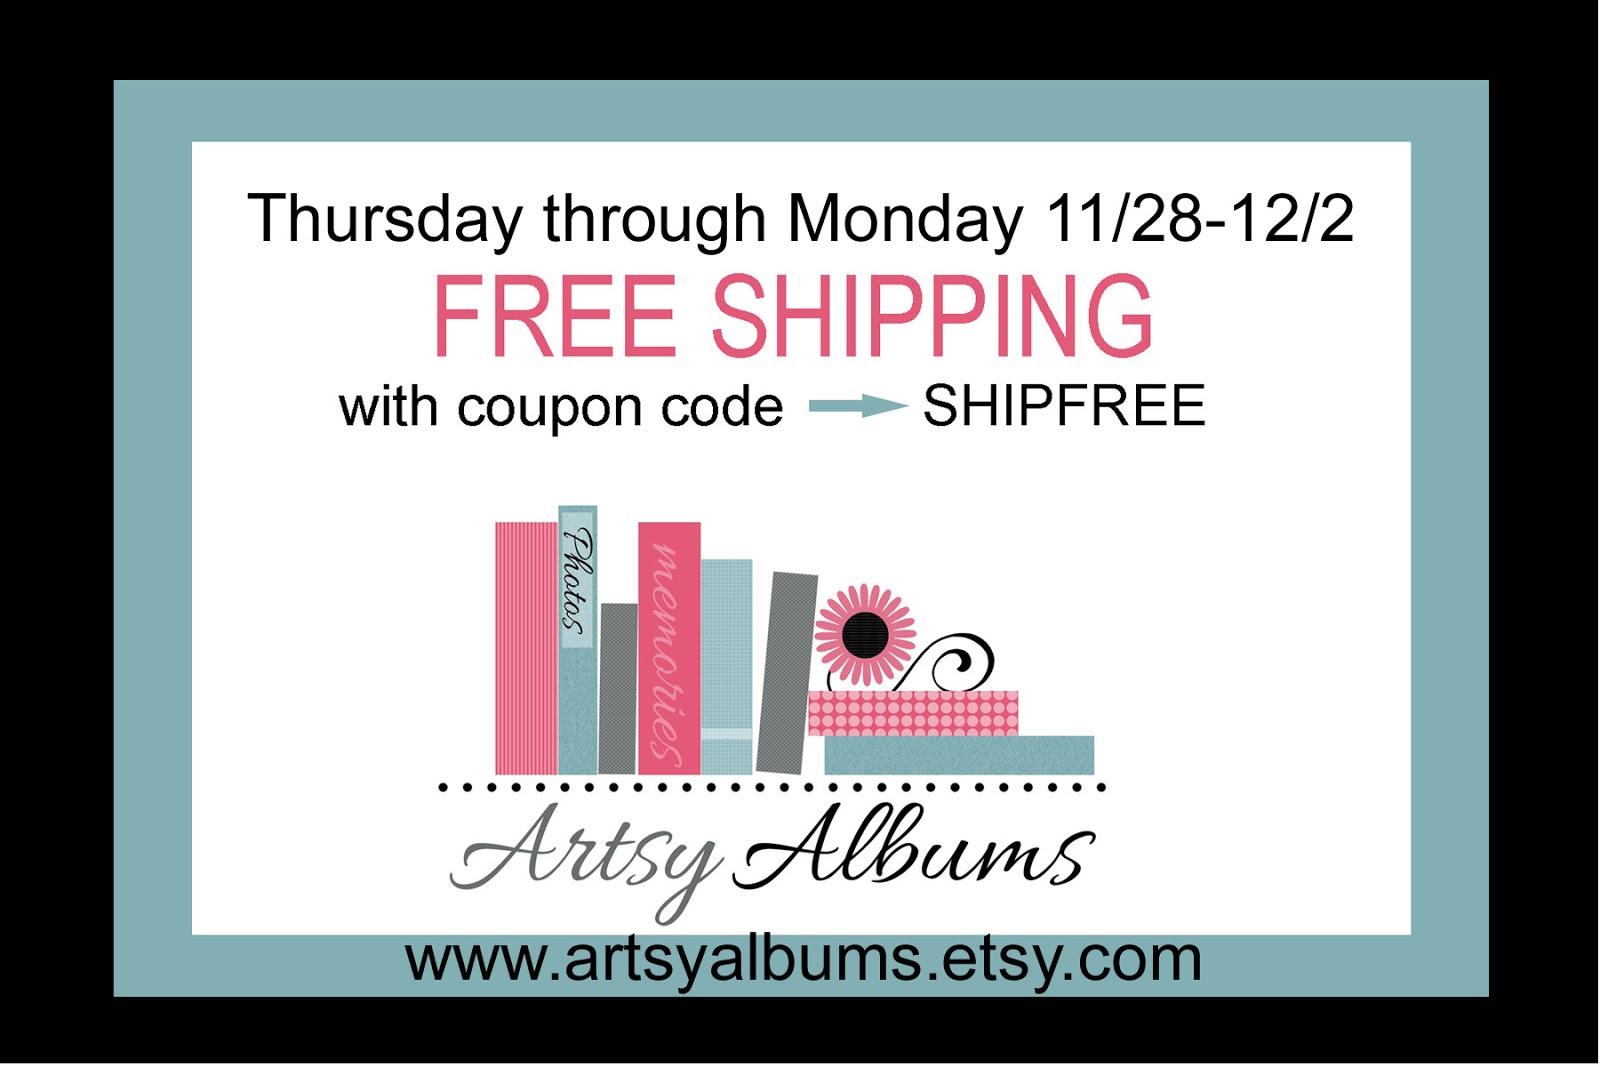 www.artsyalbums.etsy.com